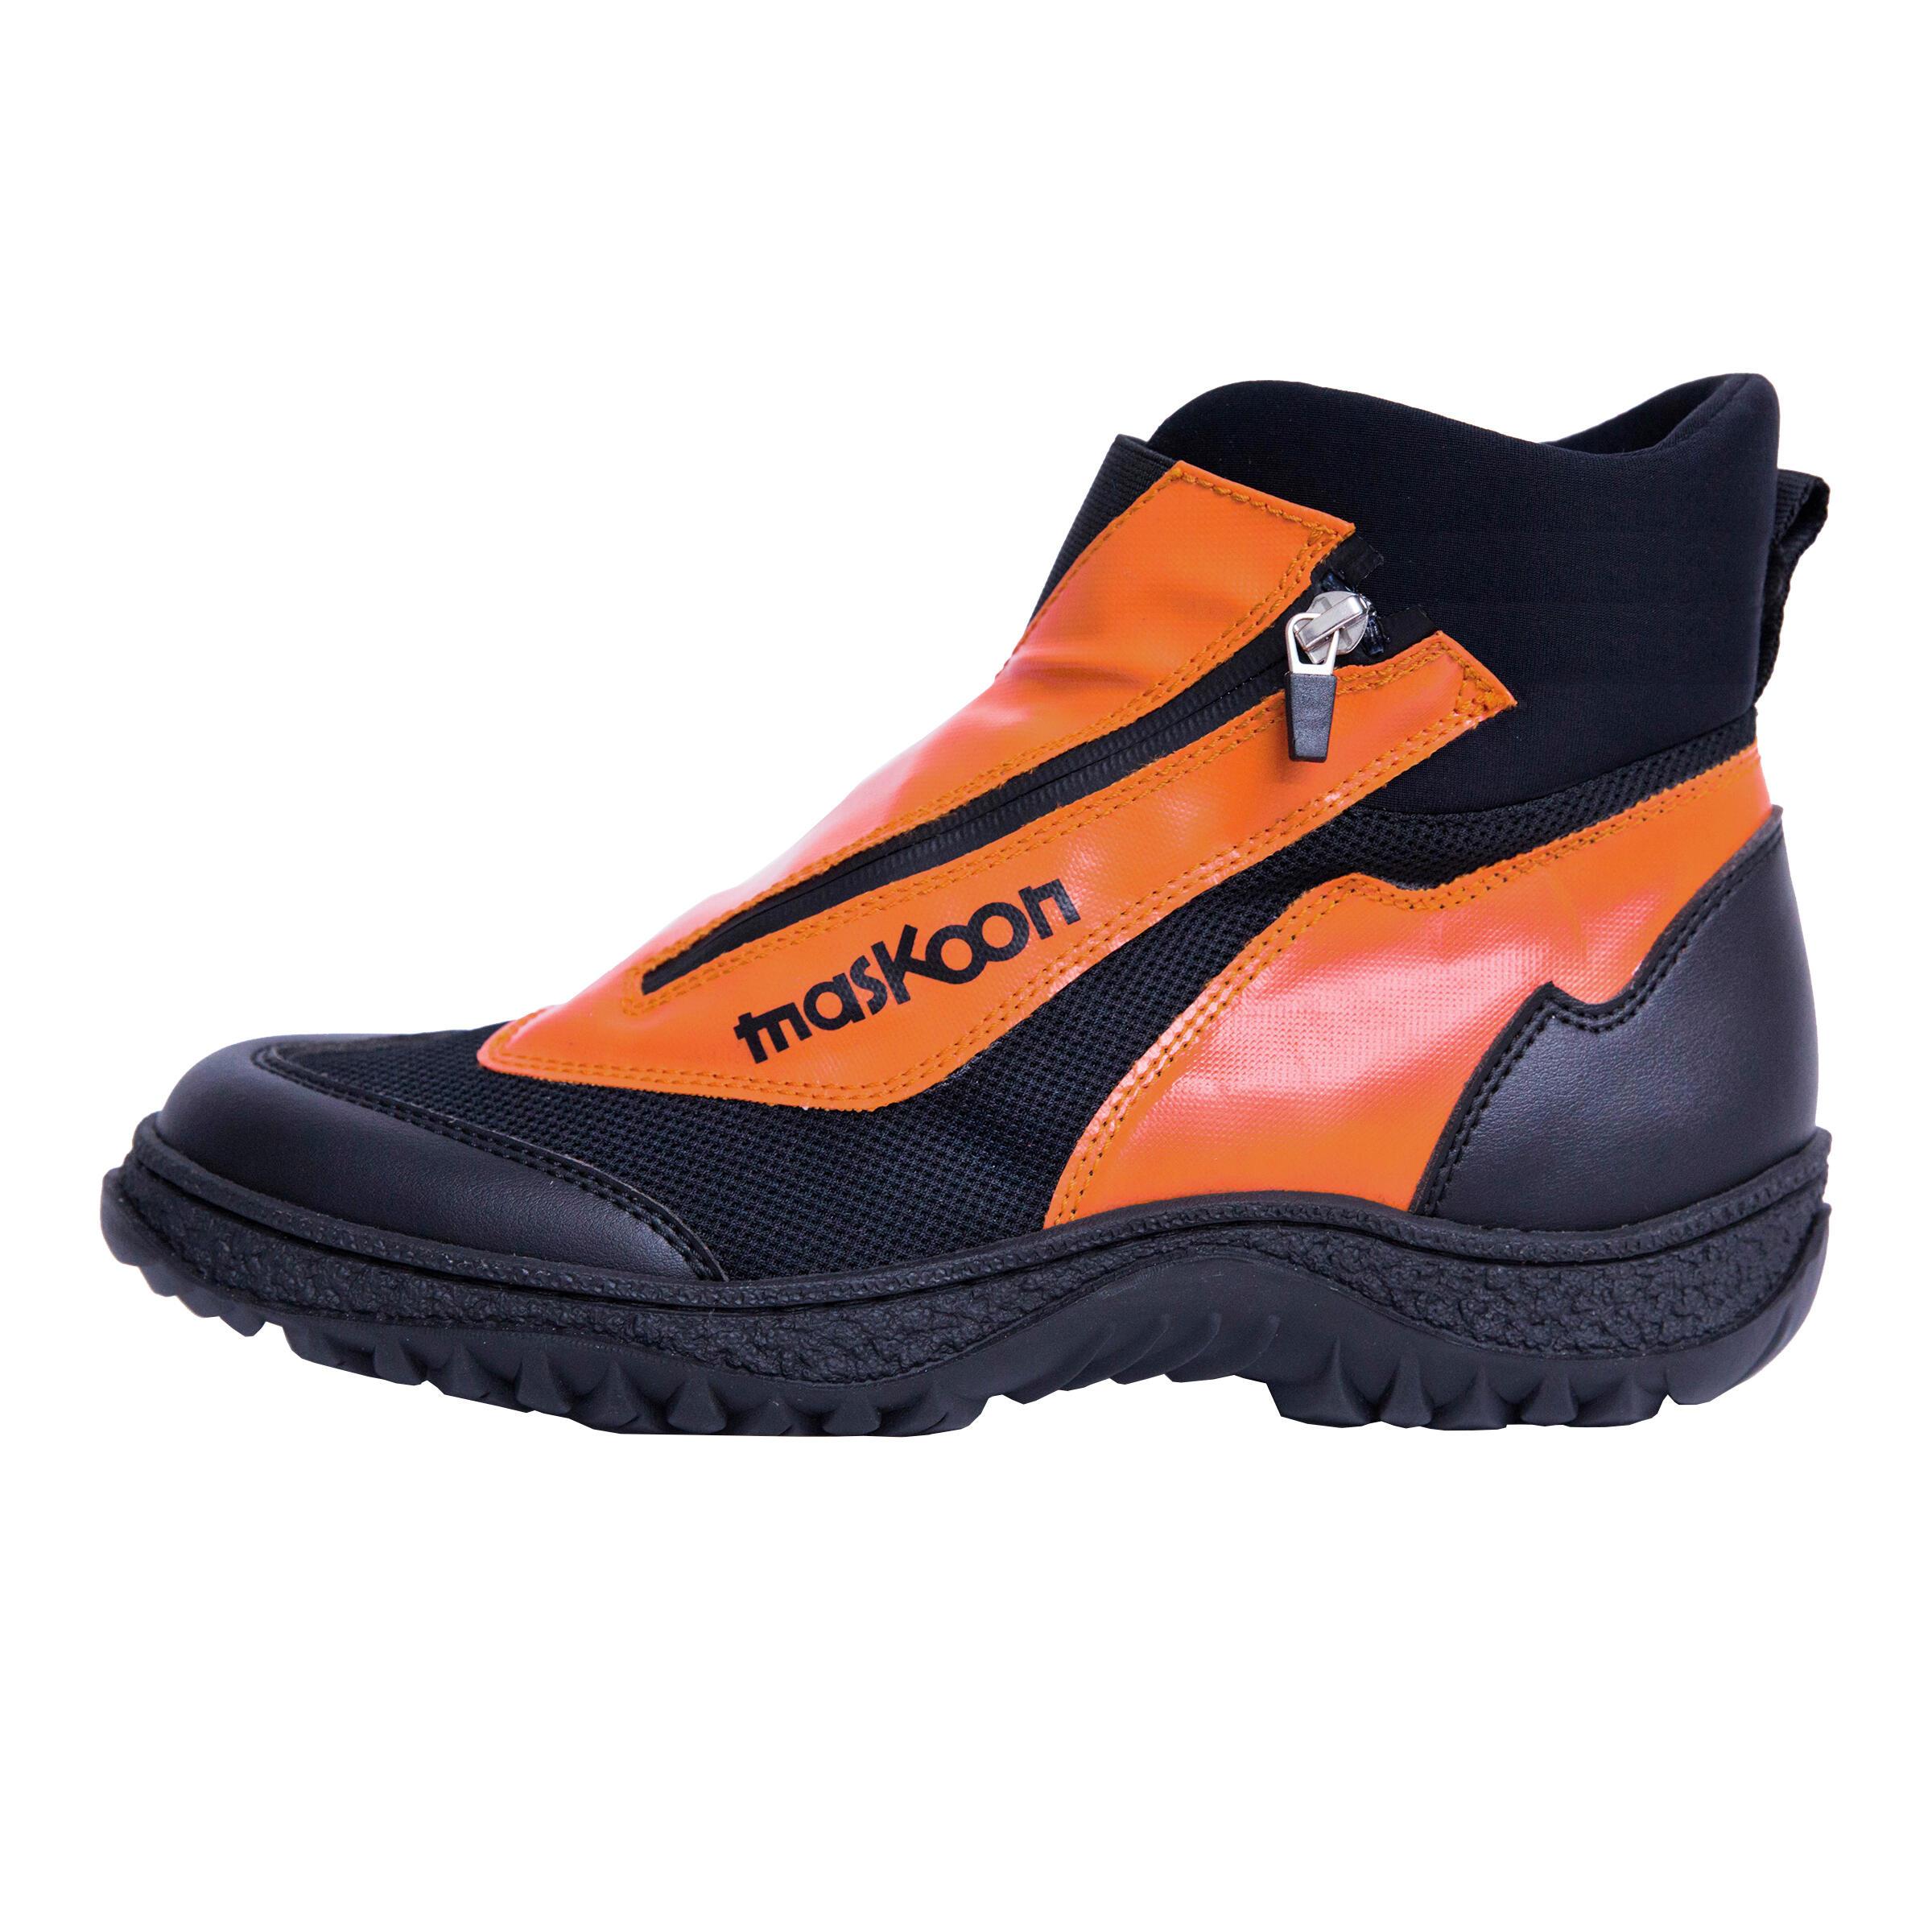 Maskoon Canyoning schoenen SHO 500